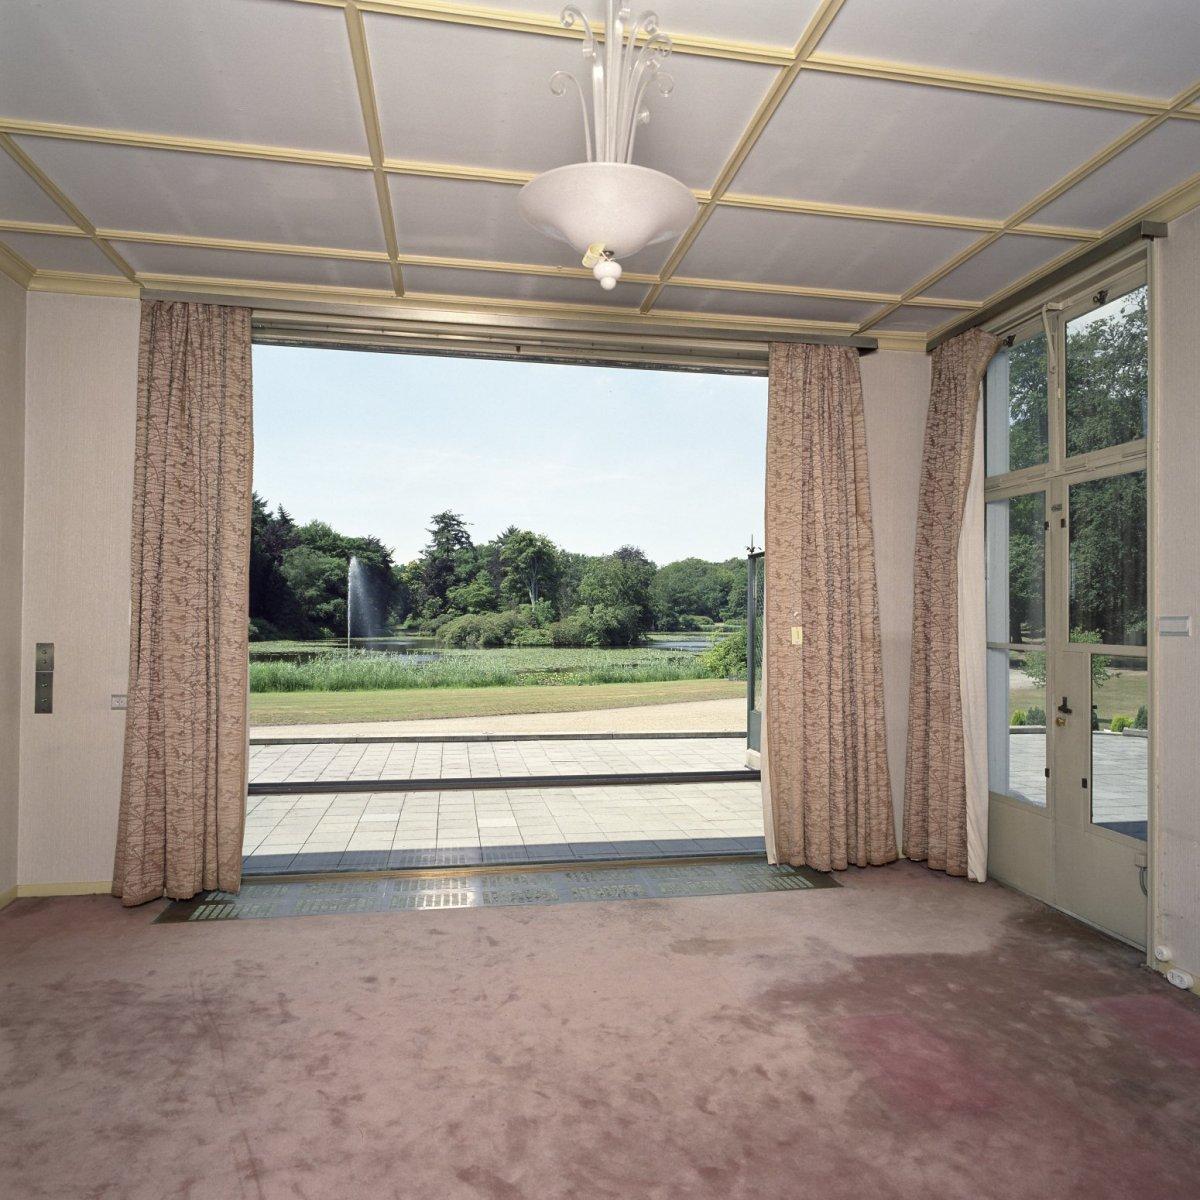 File werkkamer van koningin juliana met raamconstructie en for Interieur huiskamer